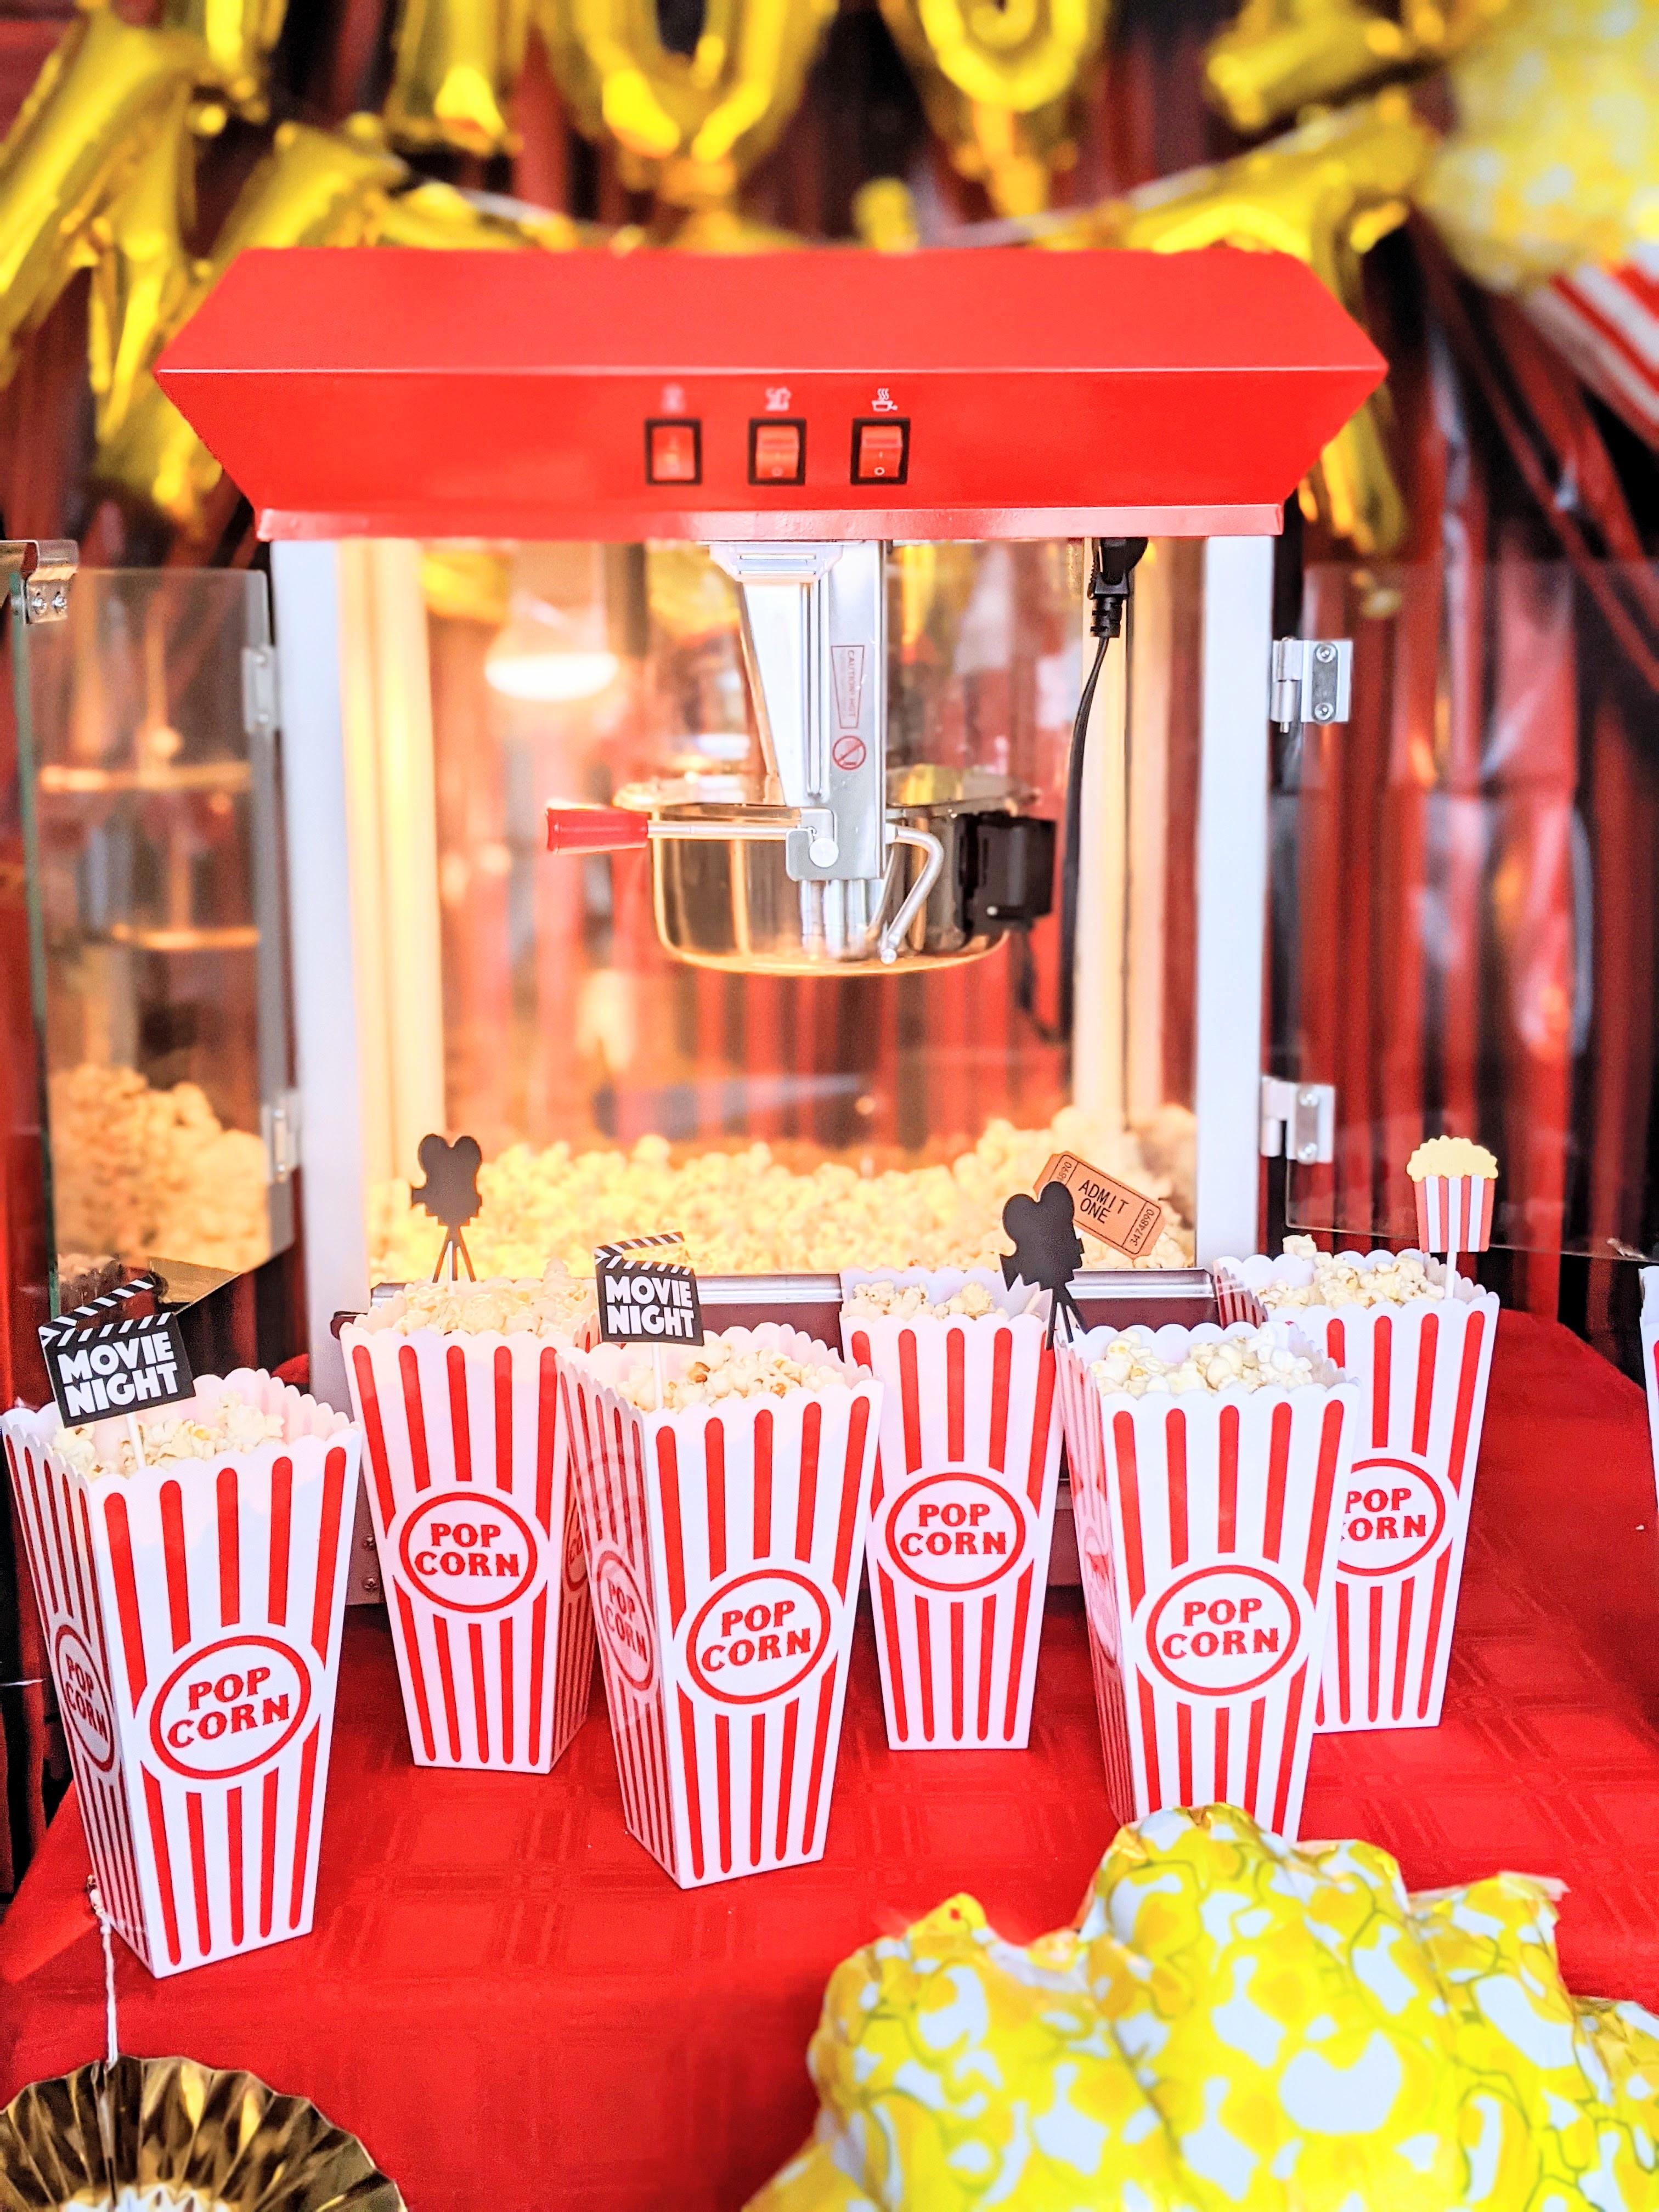 Popcorn Machine Rental Madison, WI